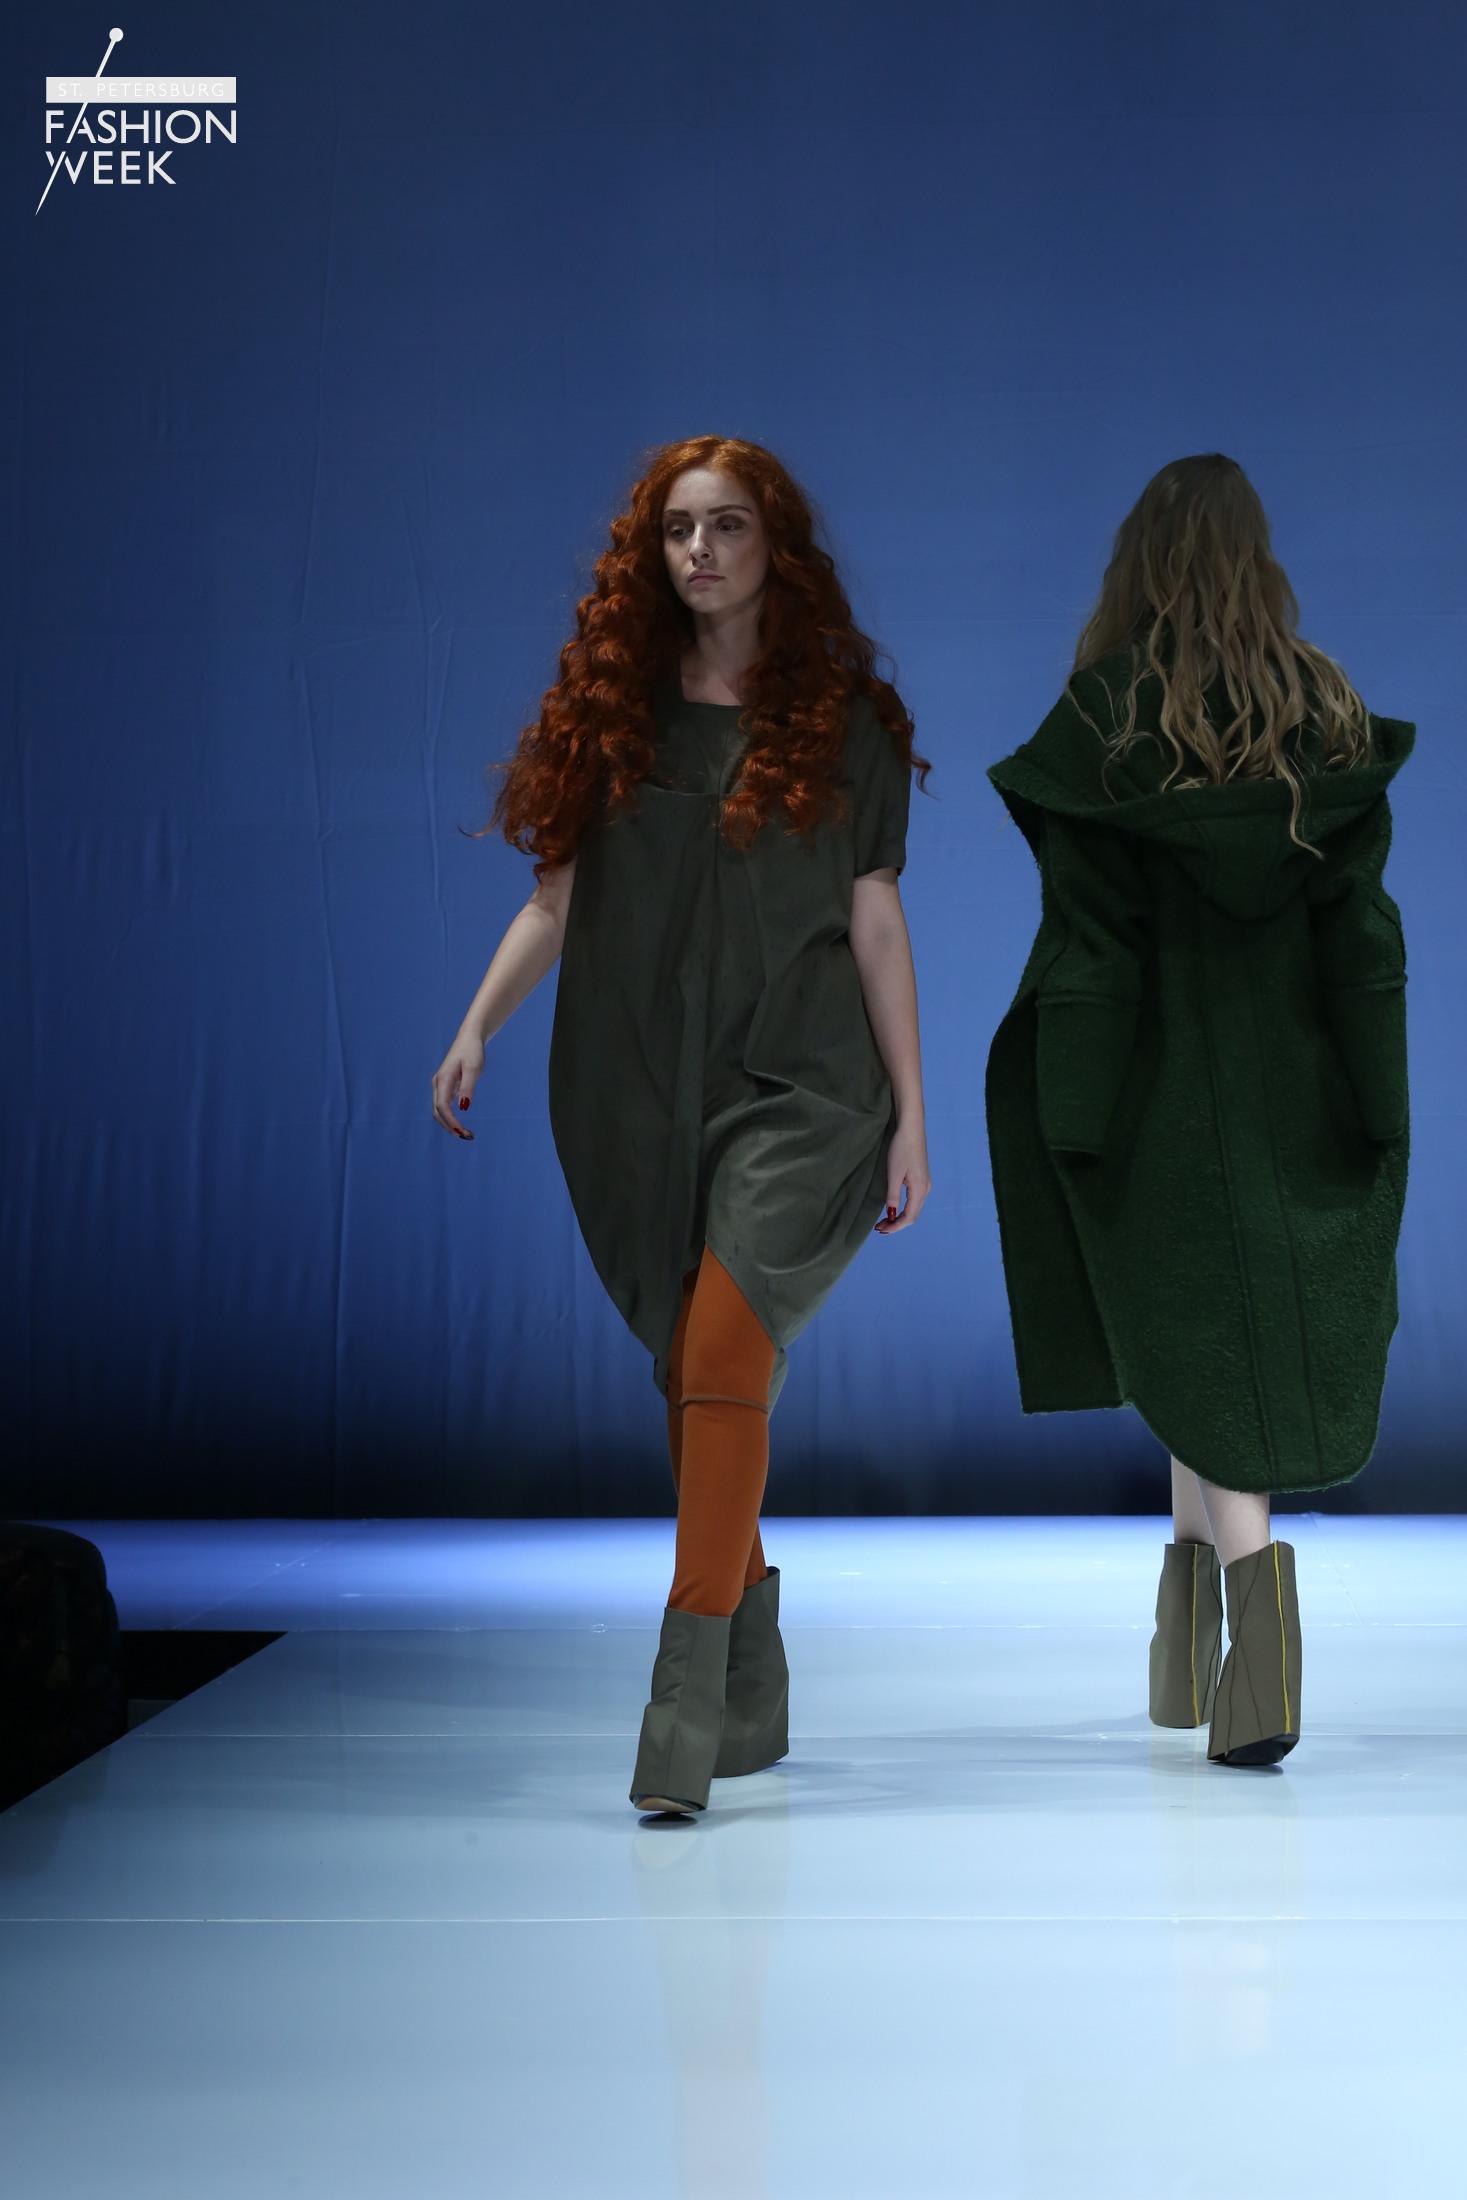 Показ коллекции ALEZZY LIRIQ на Неделе моды в Санкт-Петербурге